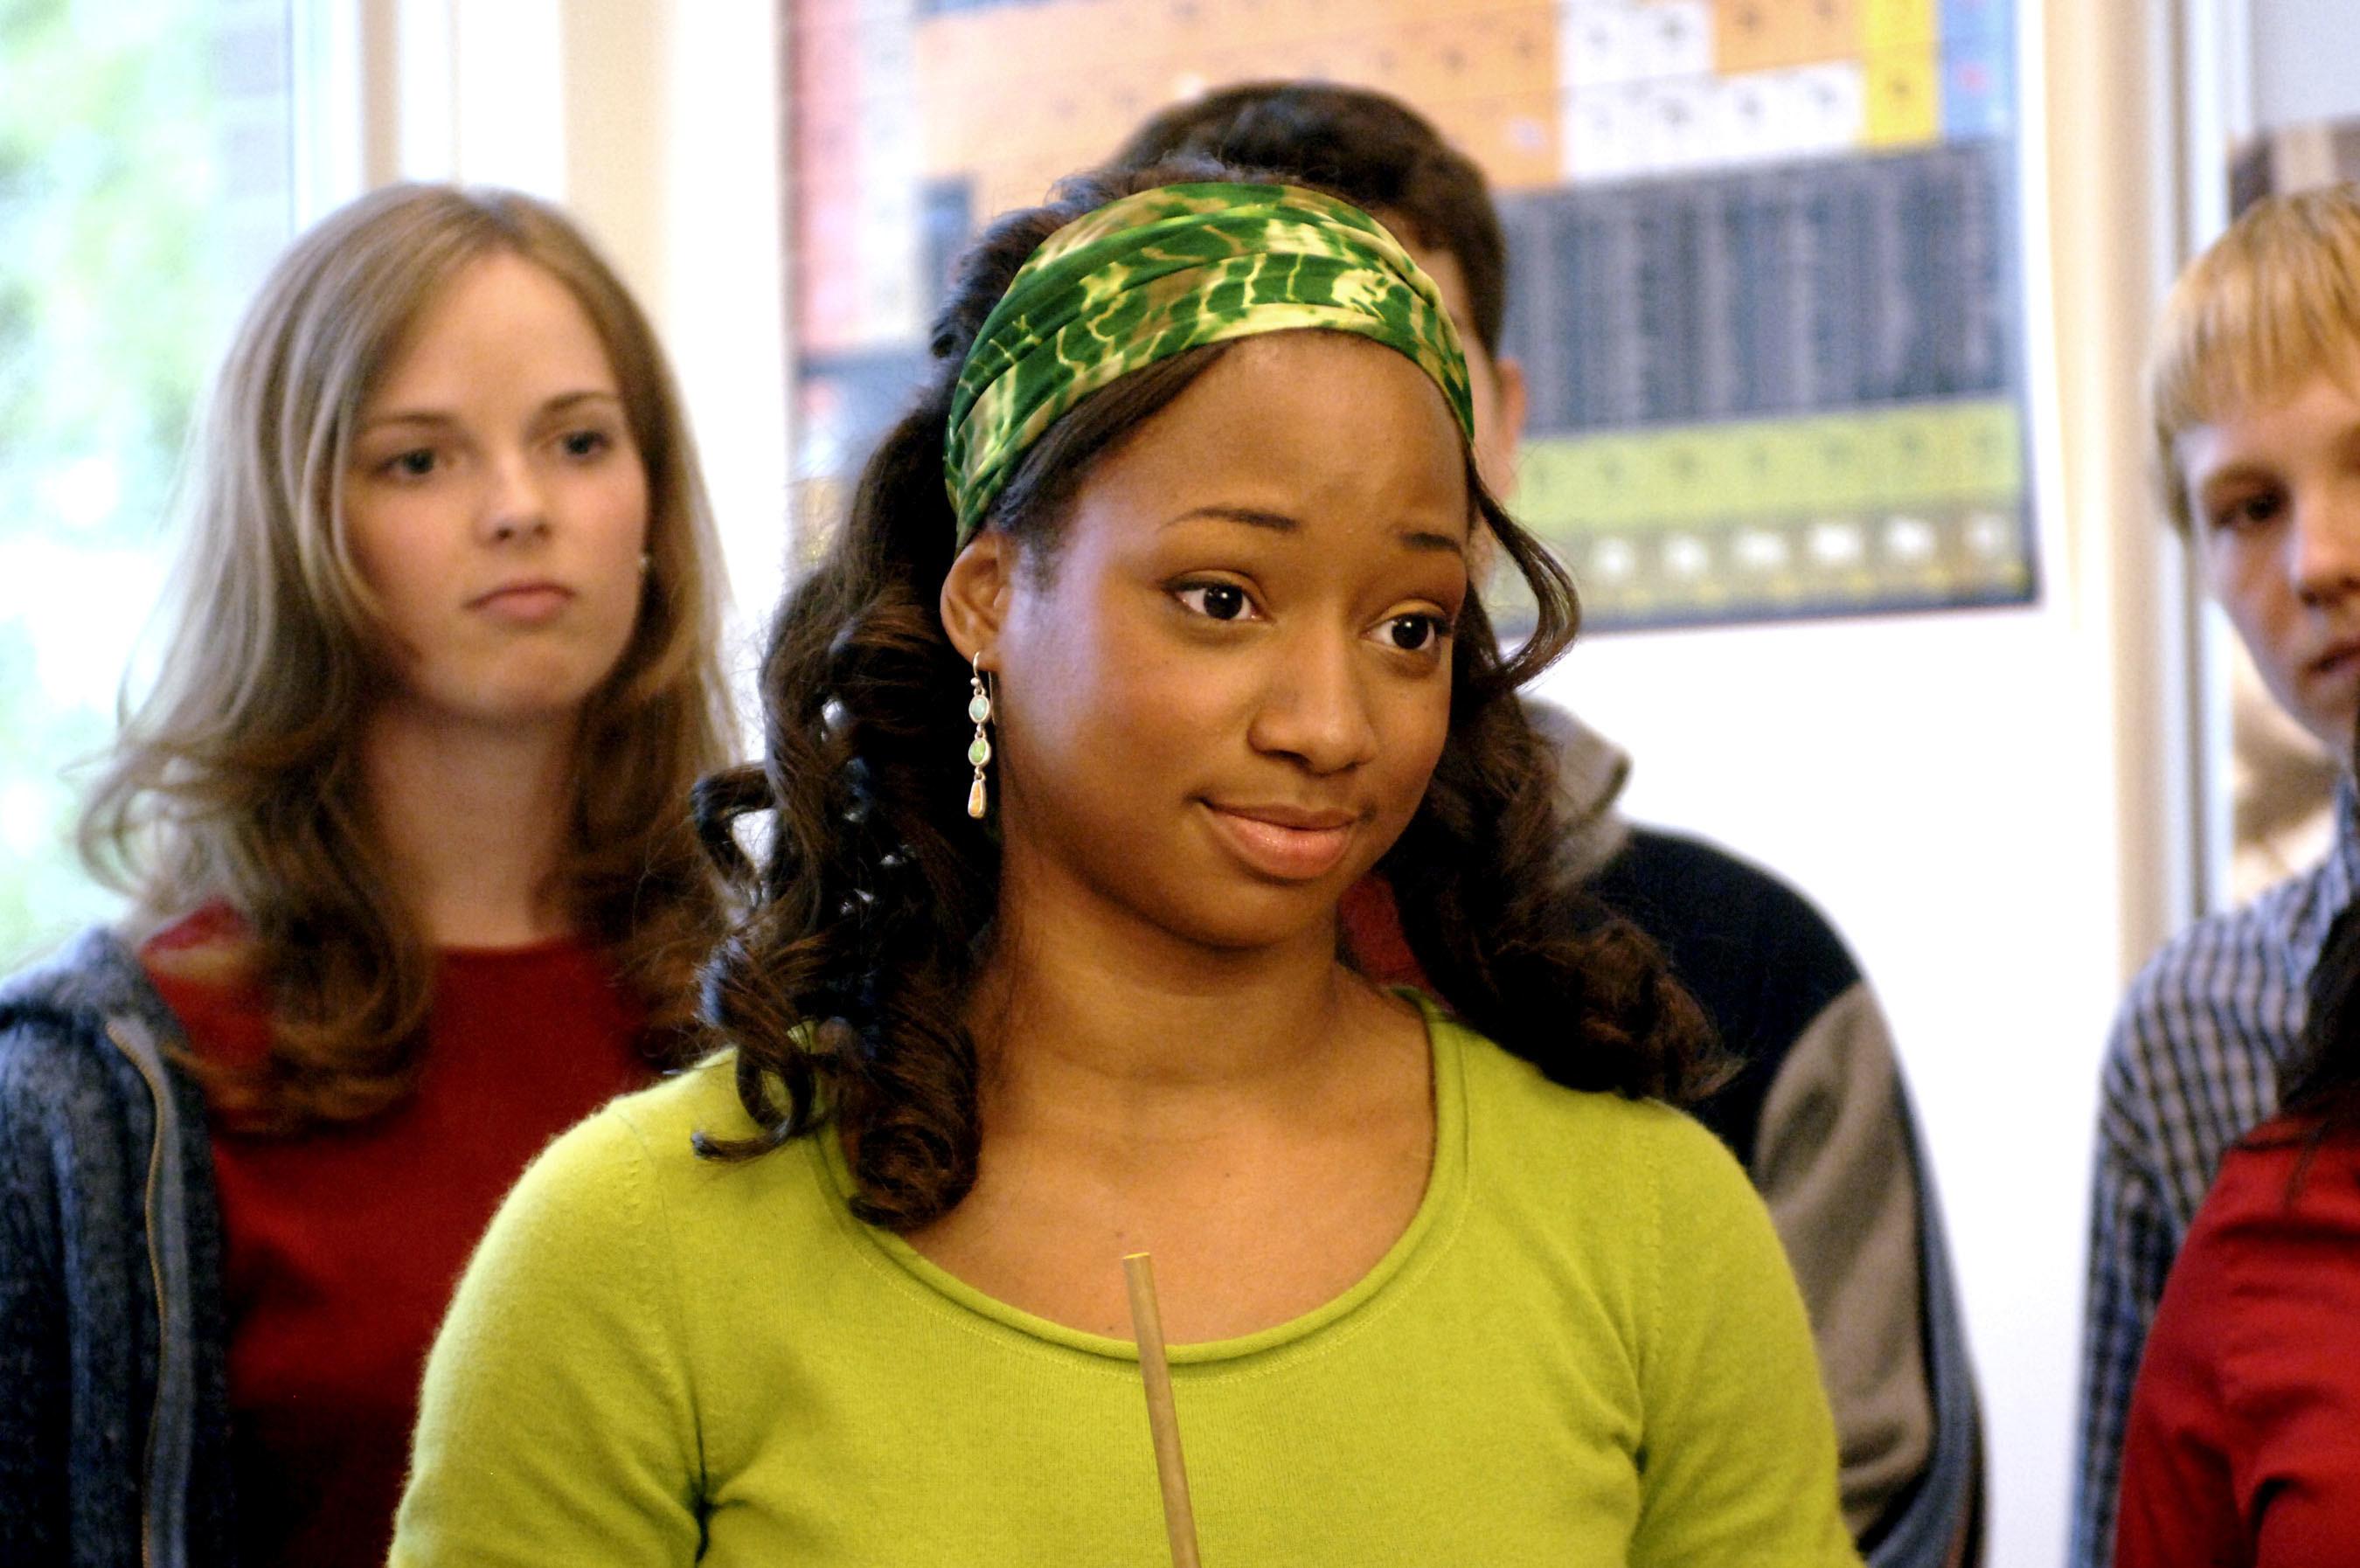 Monique as Taylor wearing a green headband